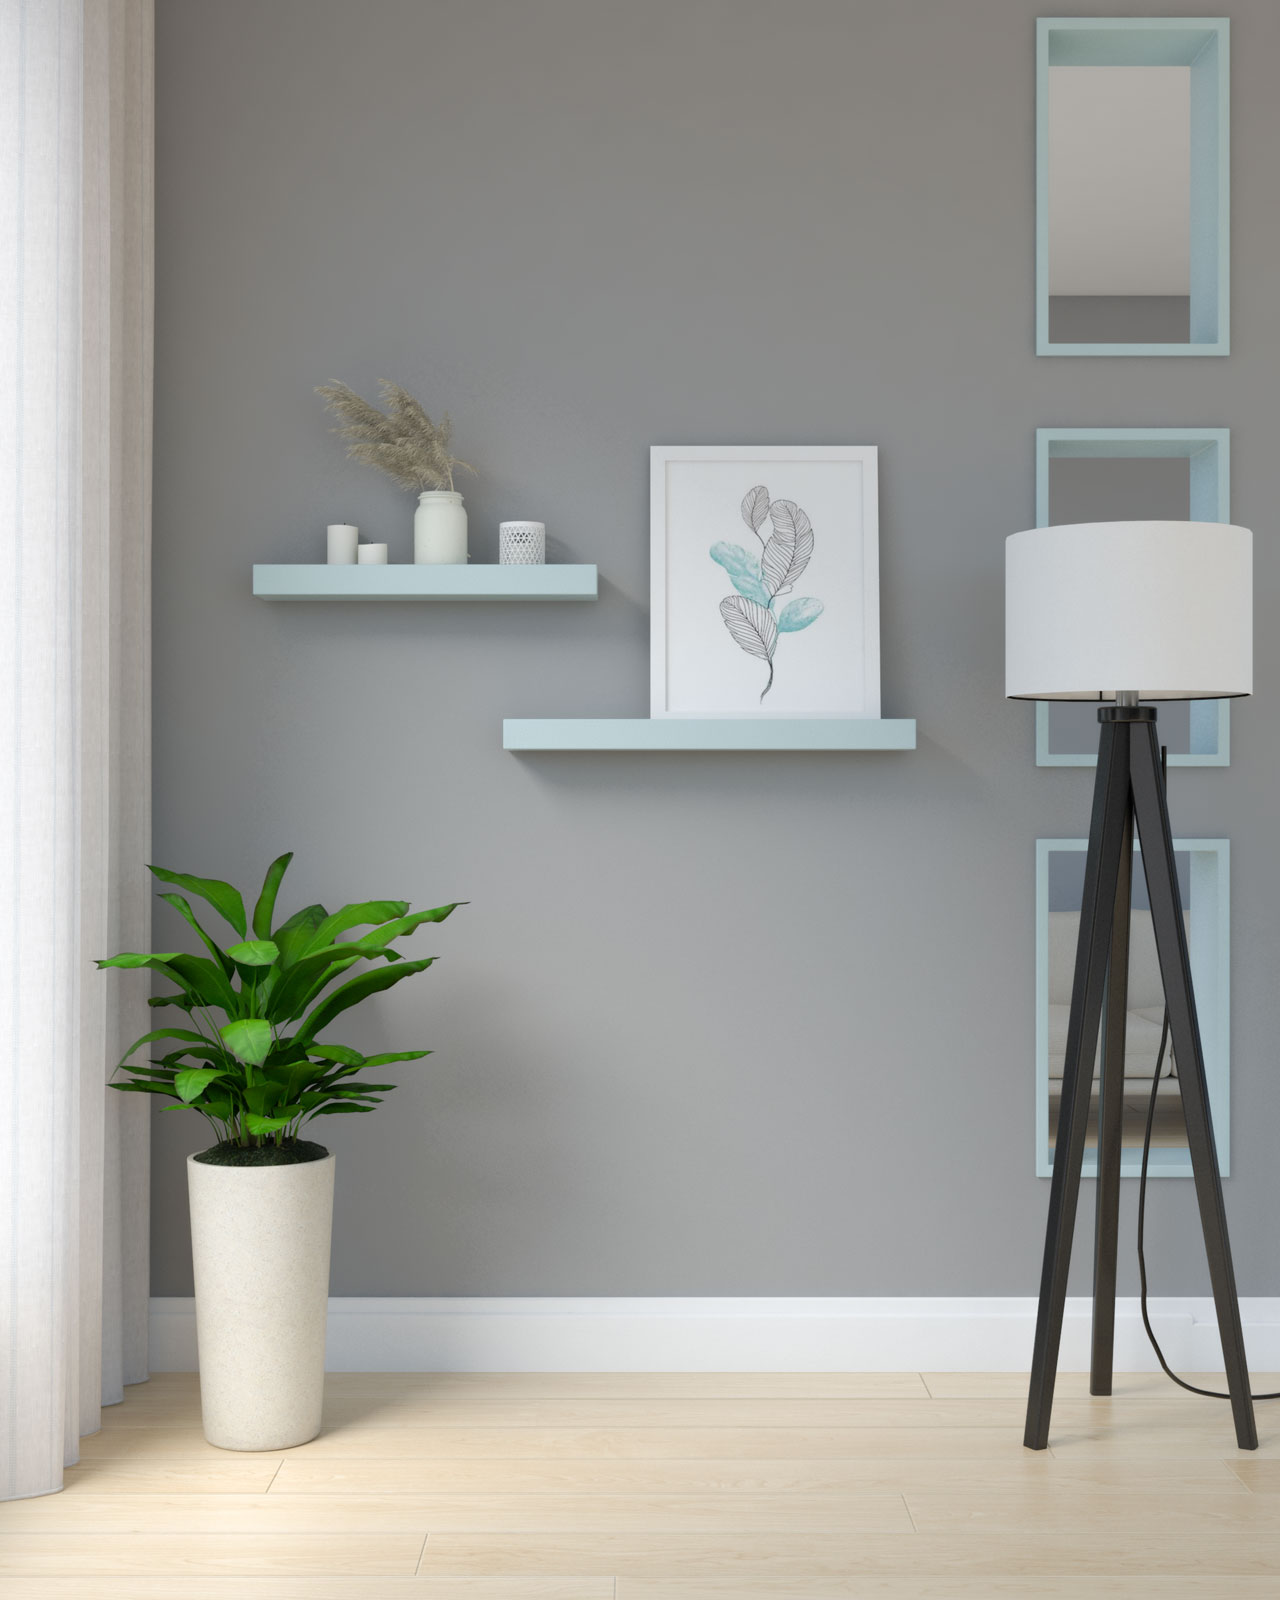 Sky blue shelves against gray wall